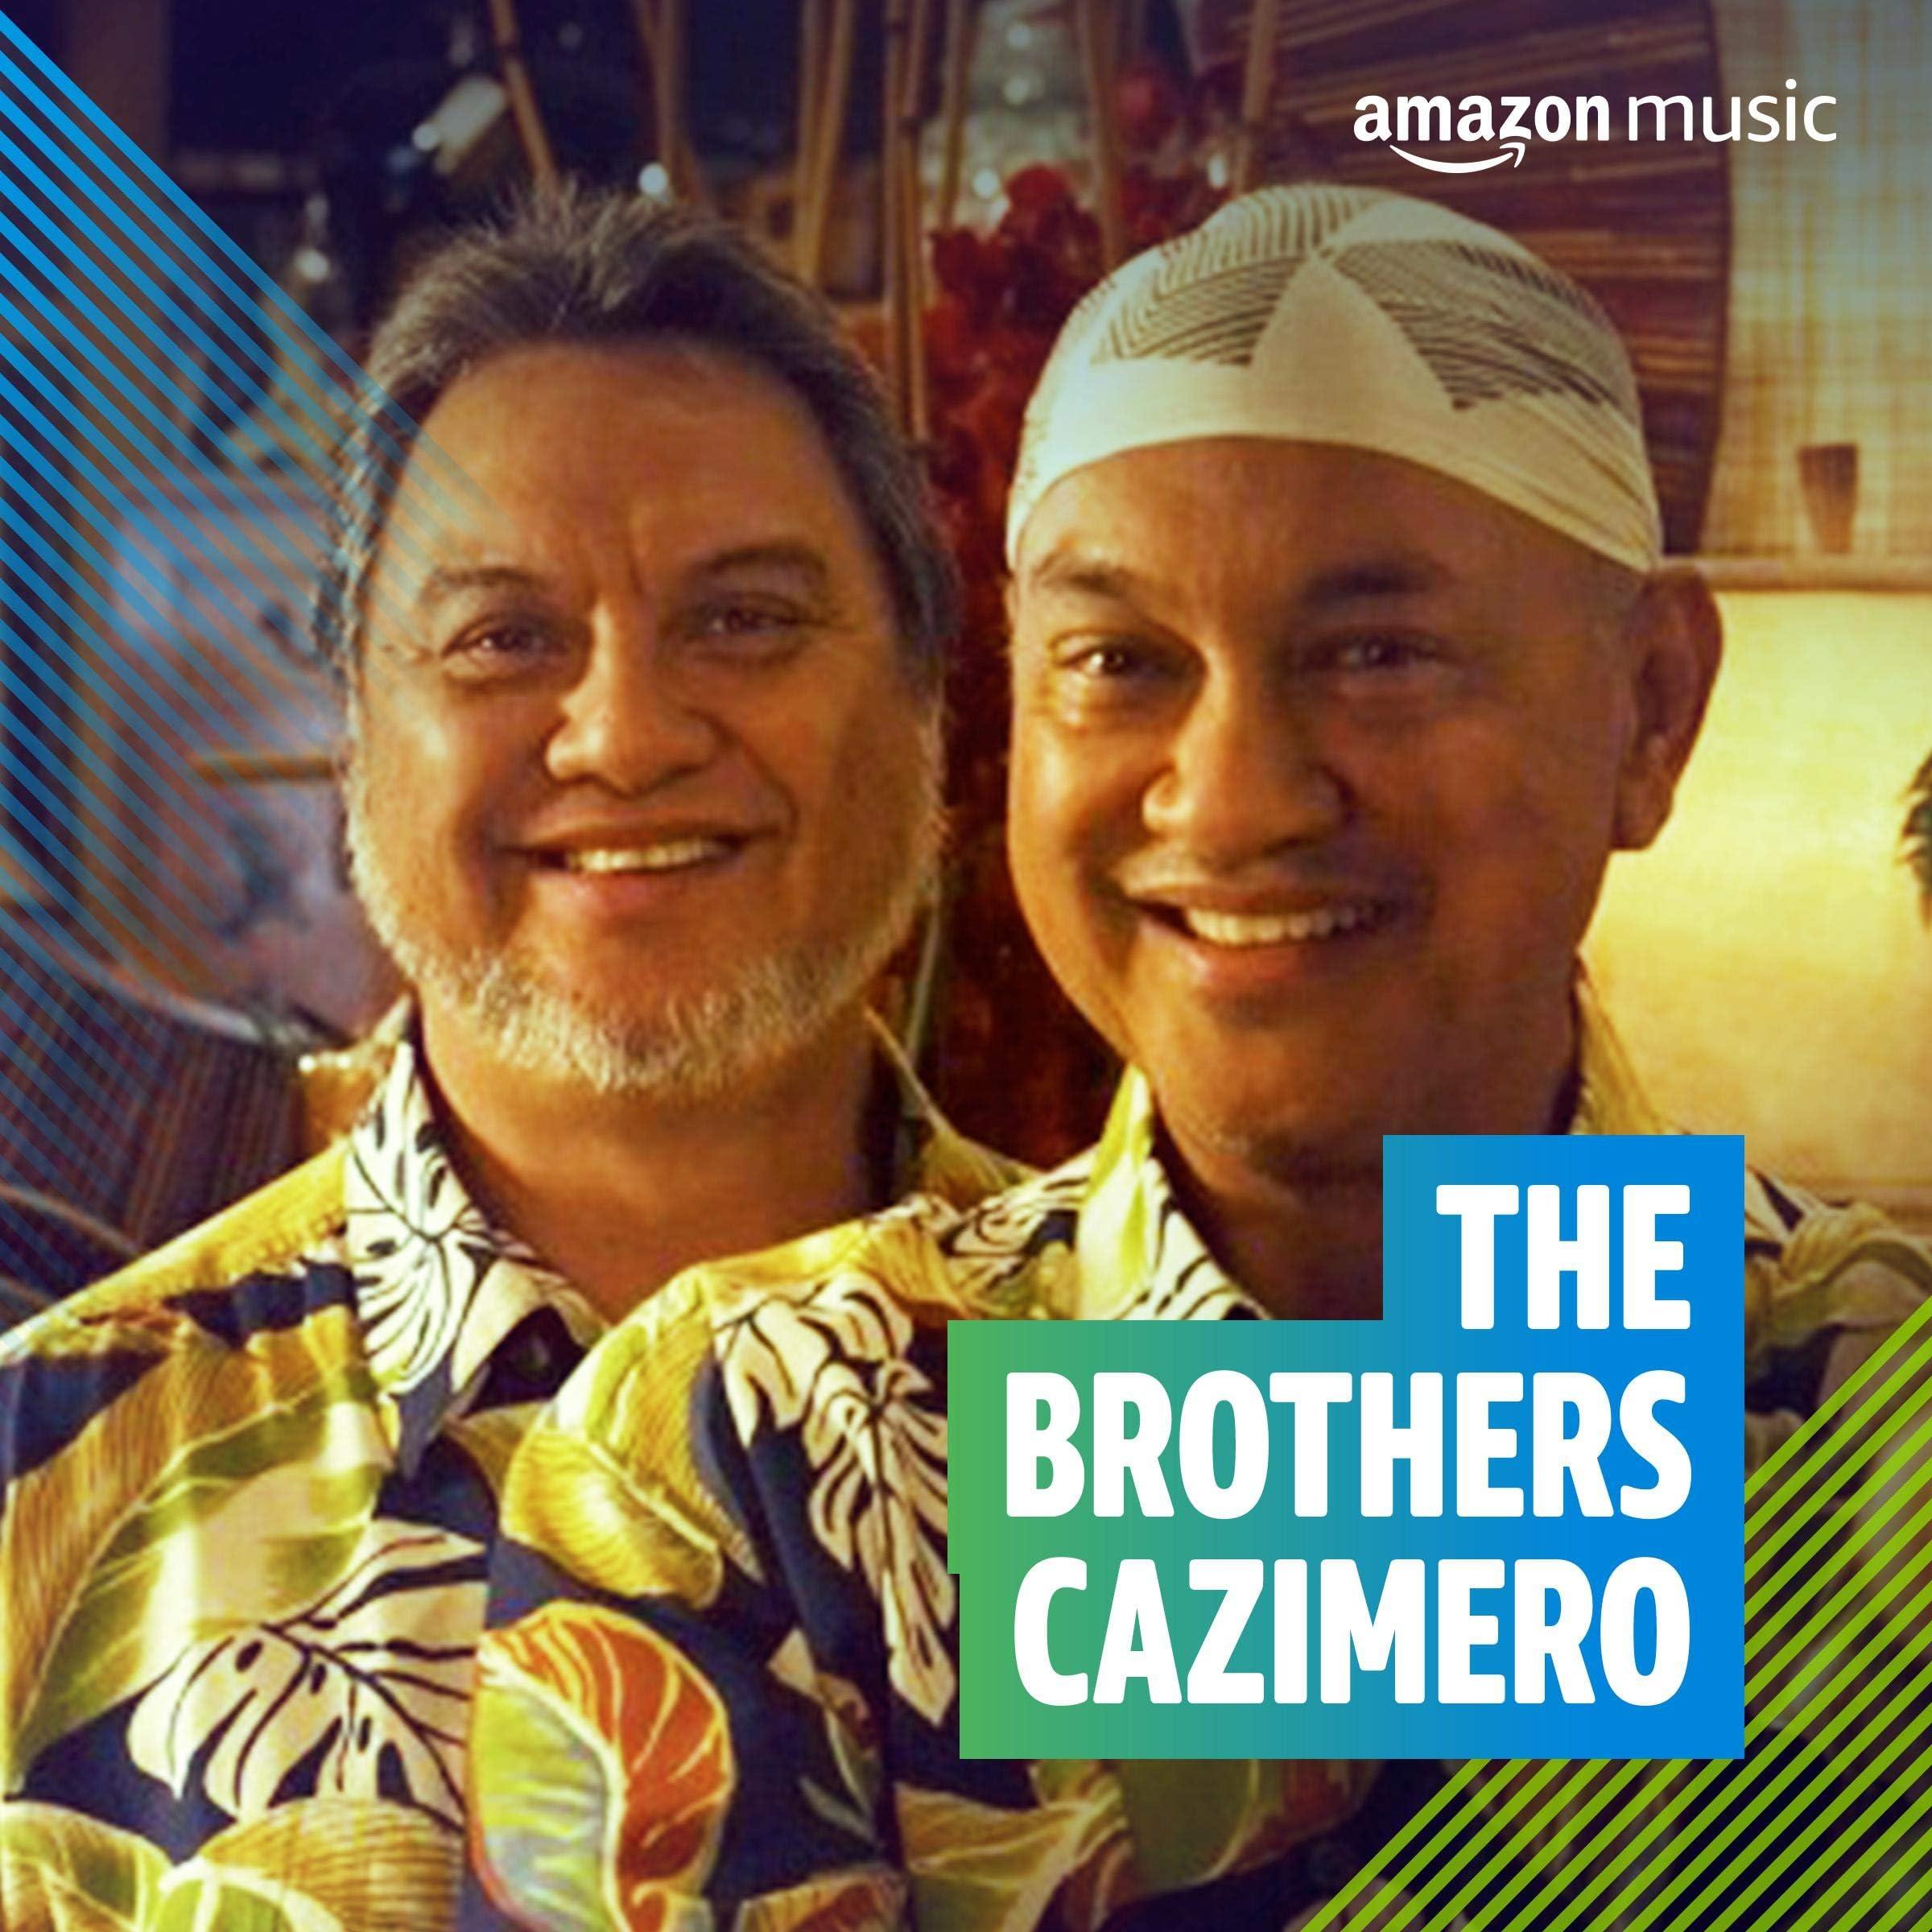 The Brothers Cazimero